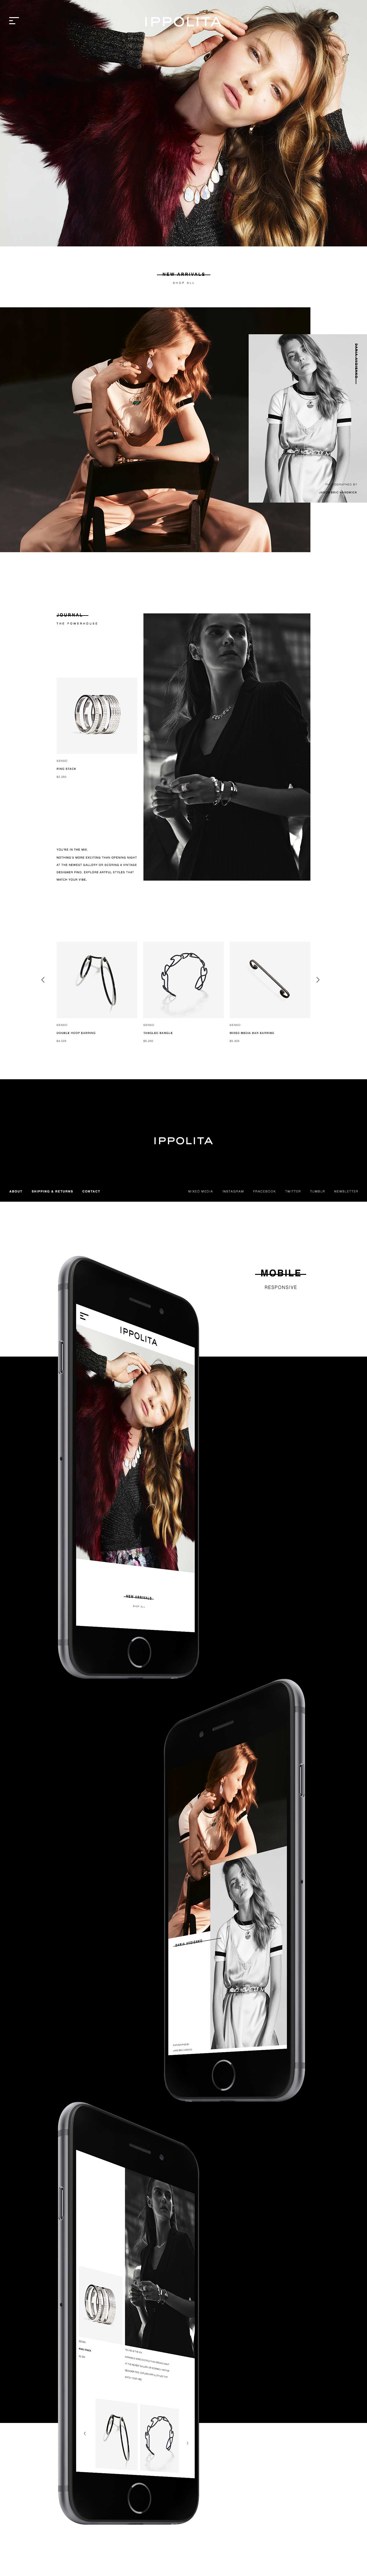 Ippolita_rebrand_project_vF.jpg